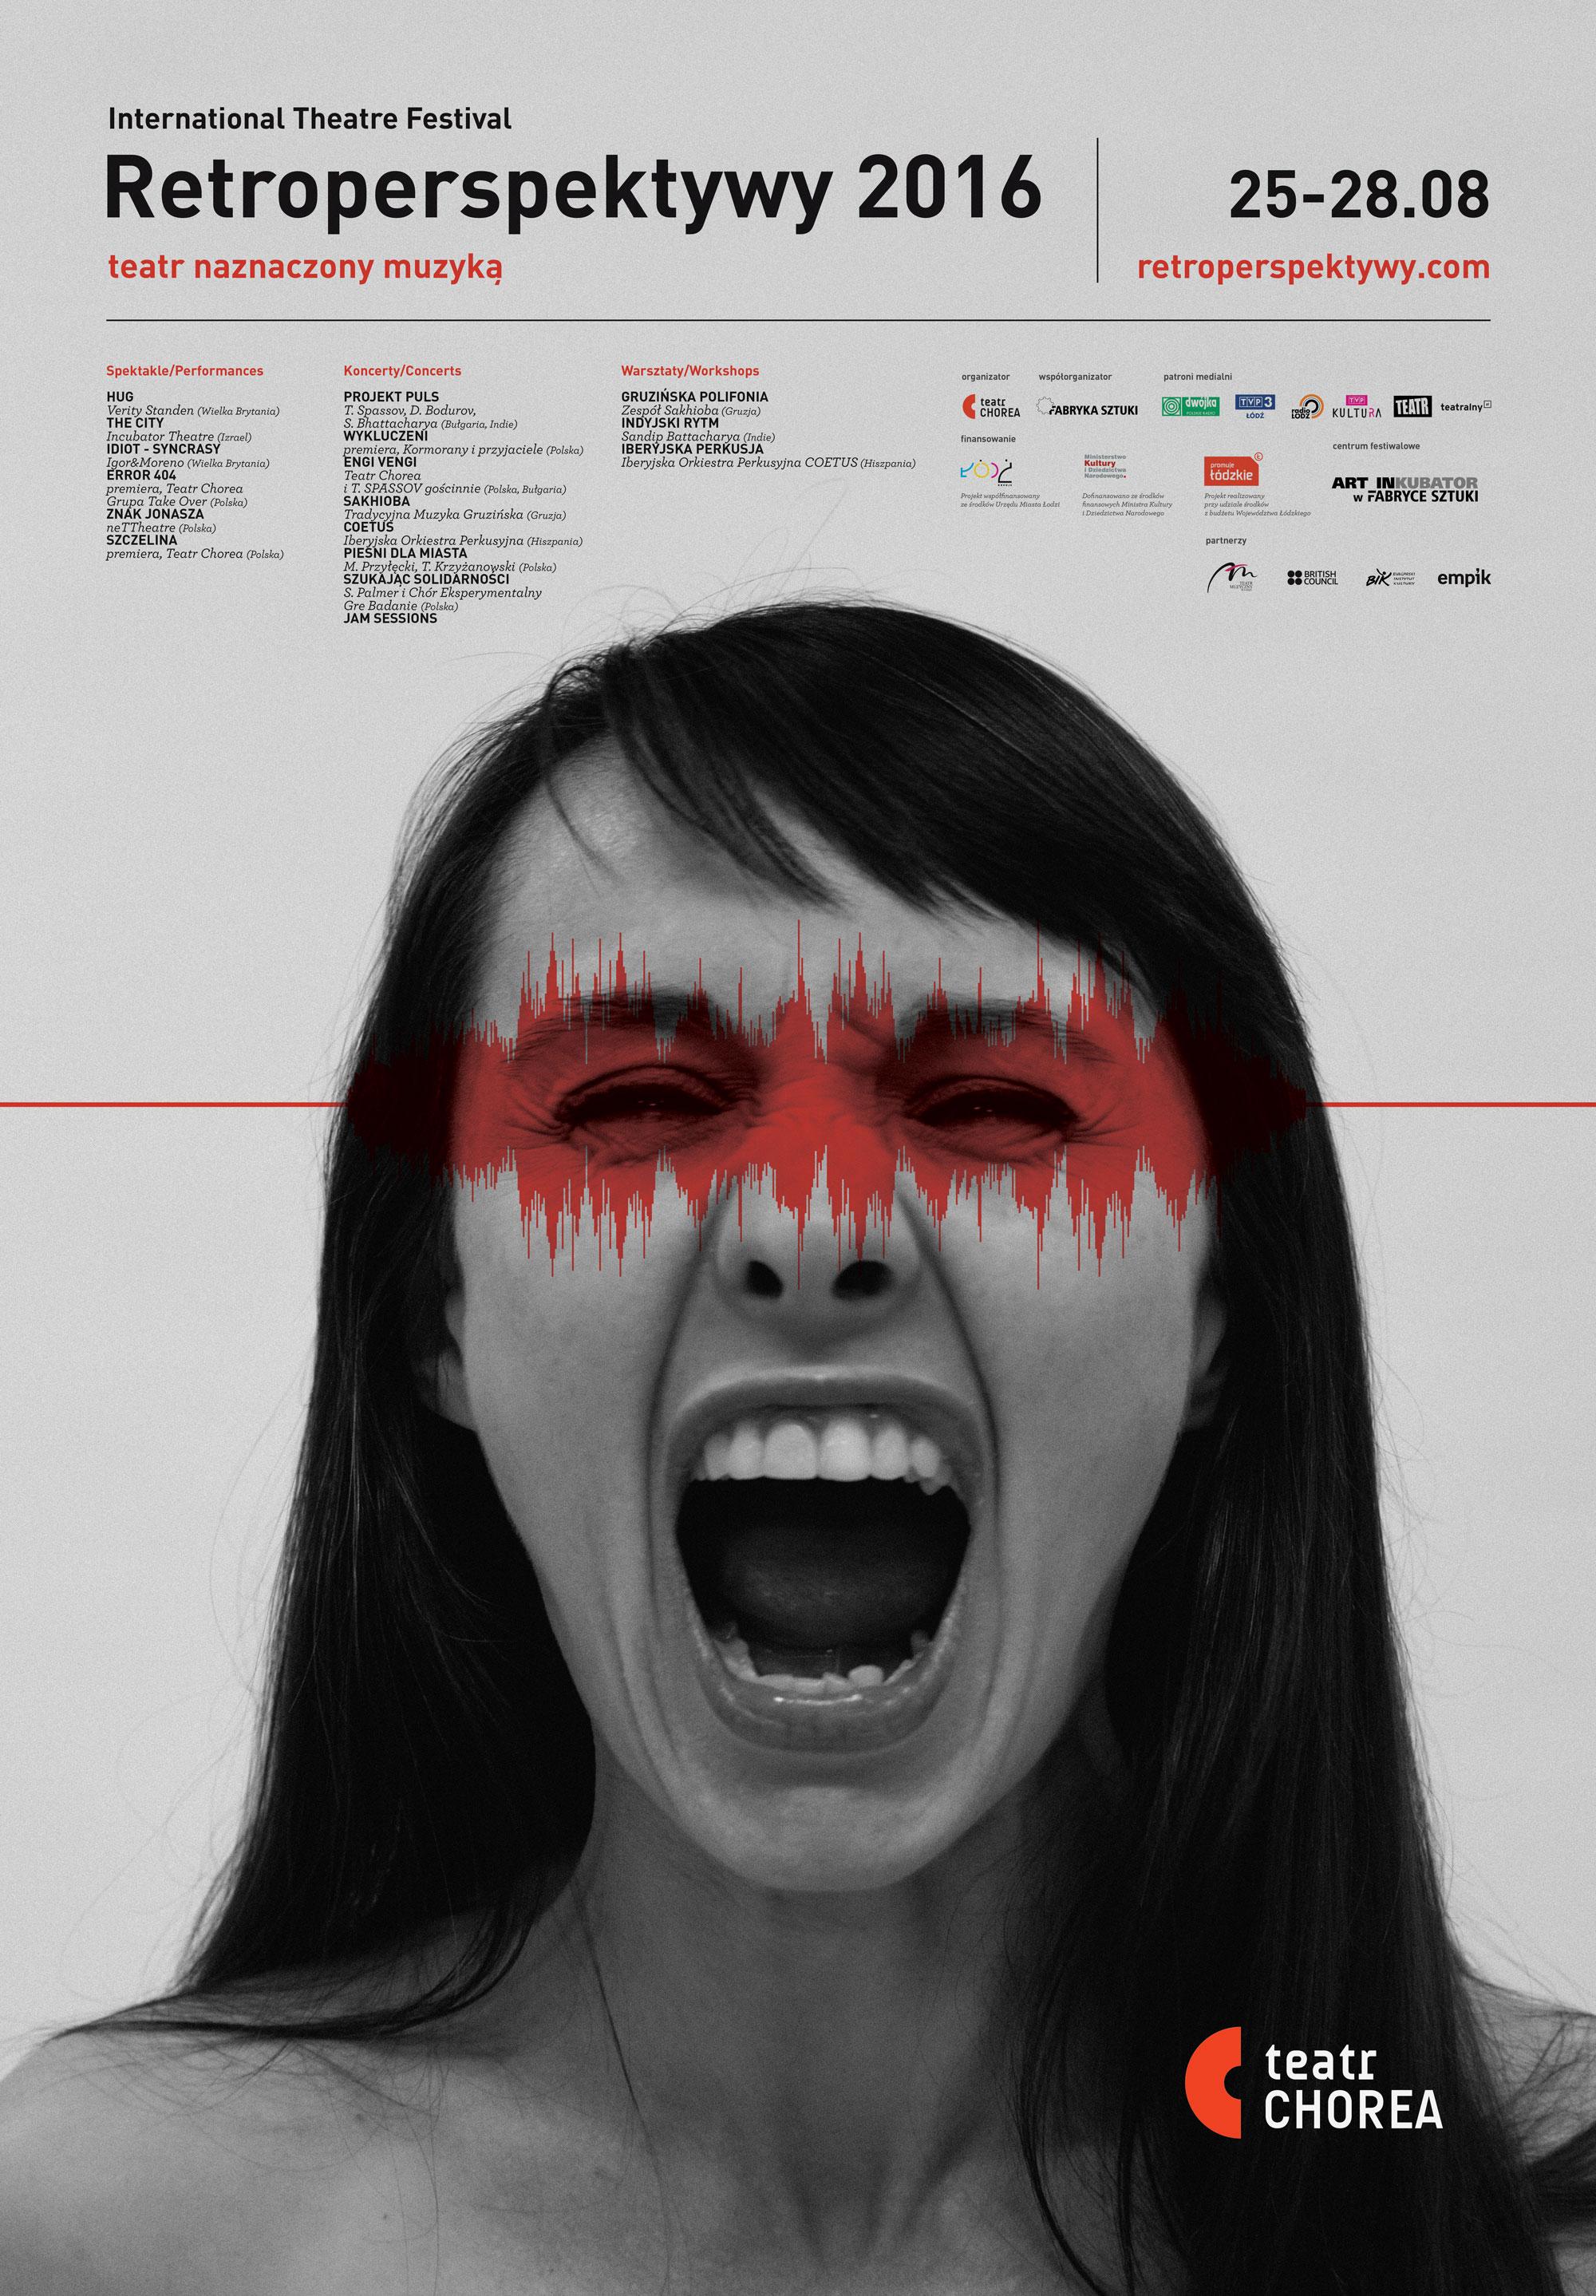 Retroperspektywy-plakat-1